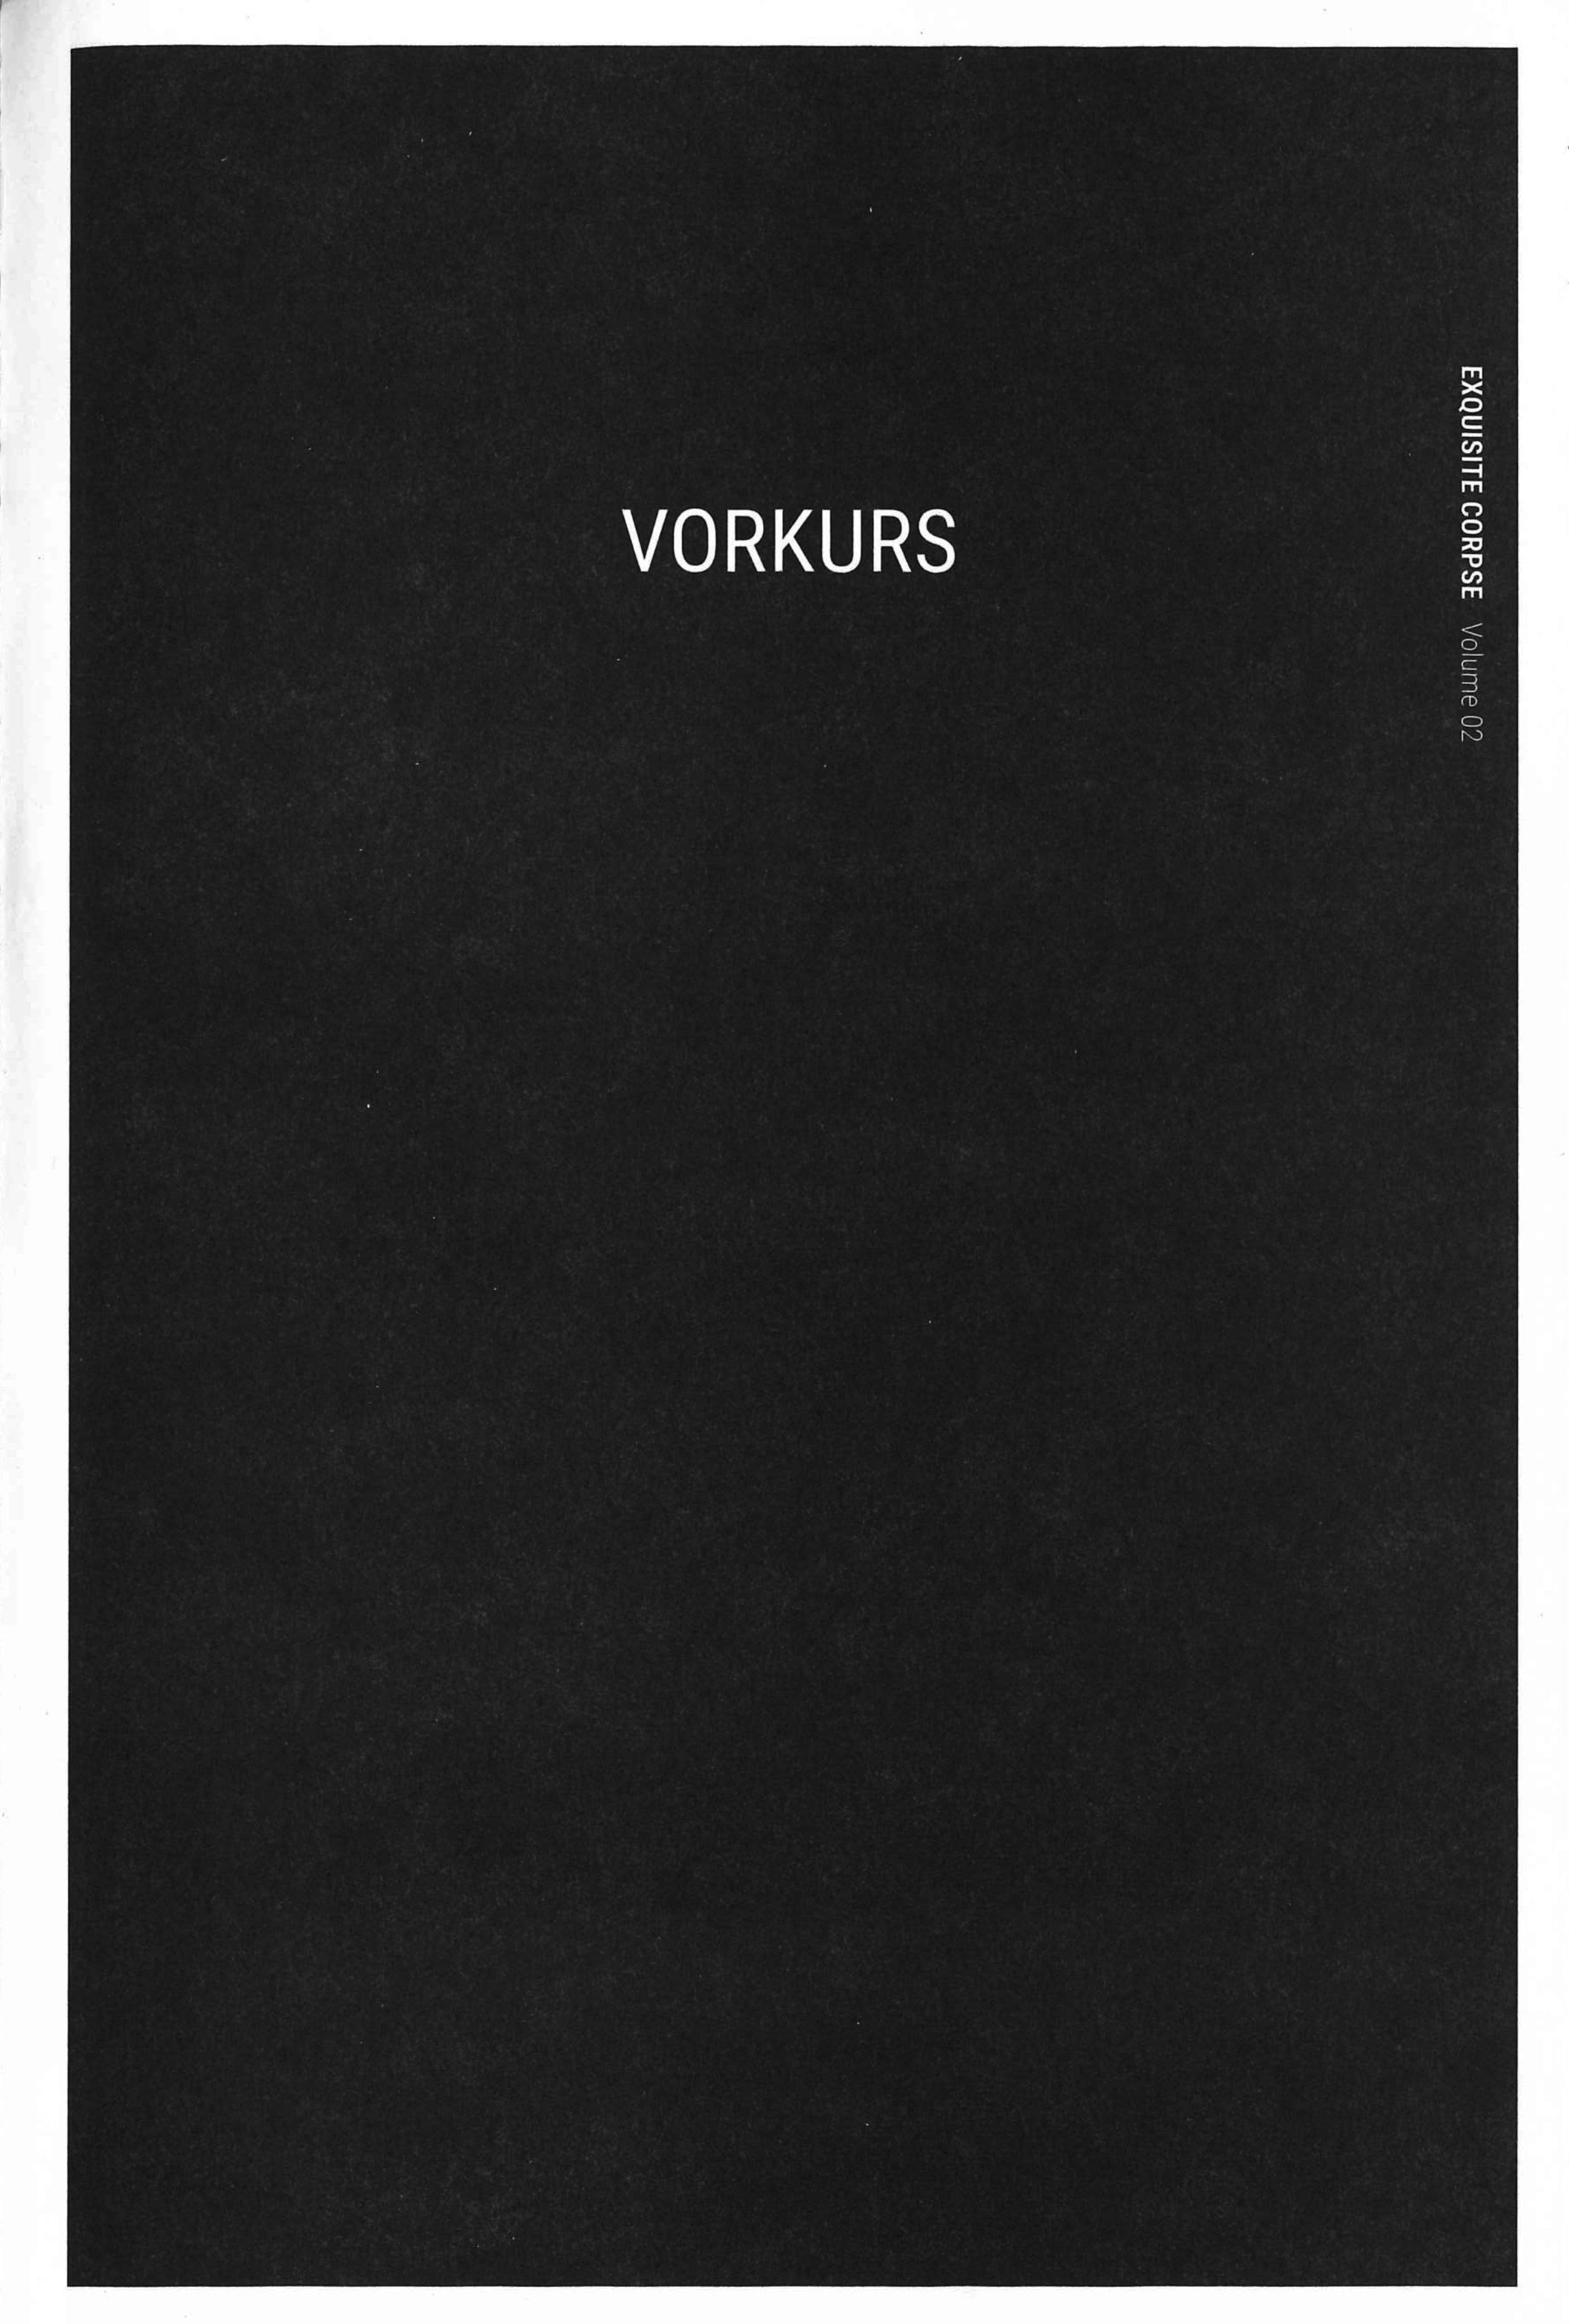 Vorkurs_Exquisite Corpse_Volume 02, University of Florida GSOA, 2018_page 03.jpg